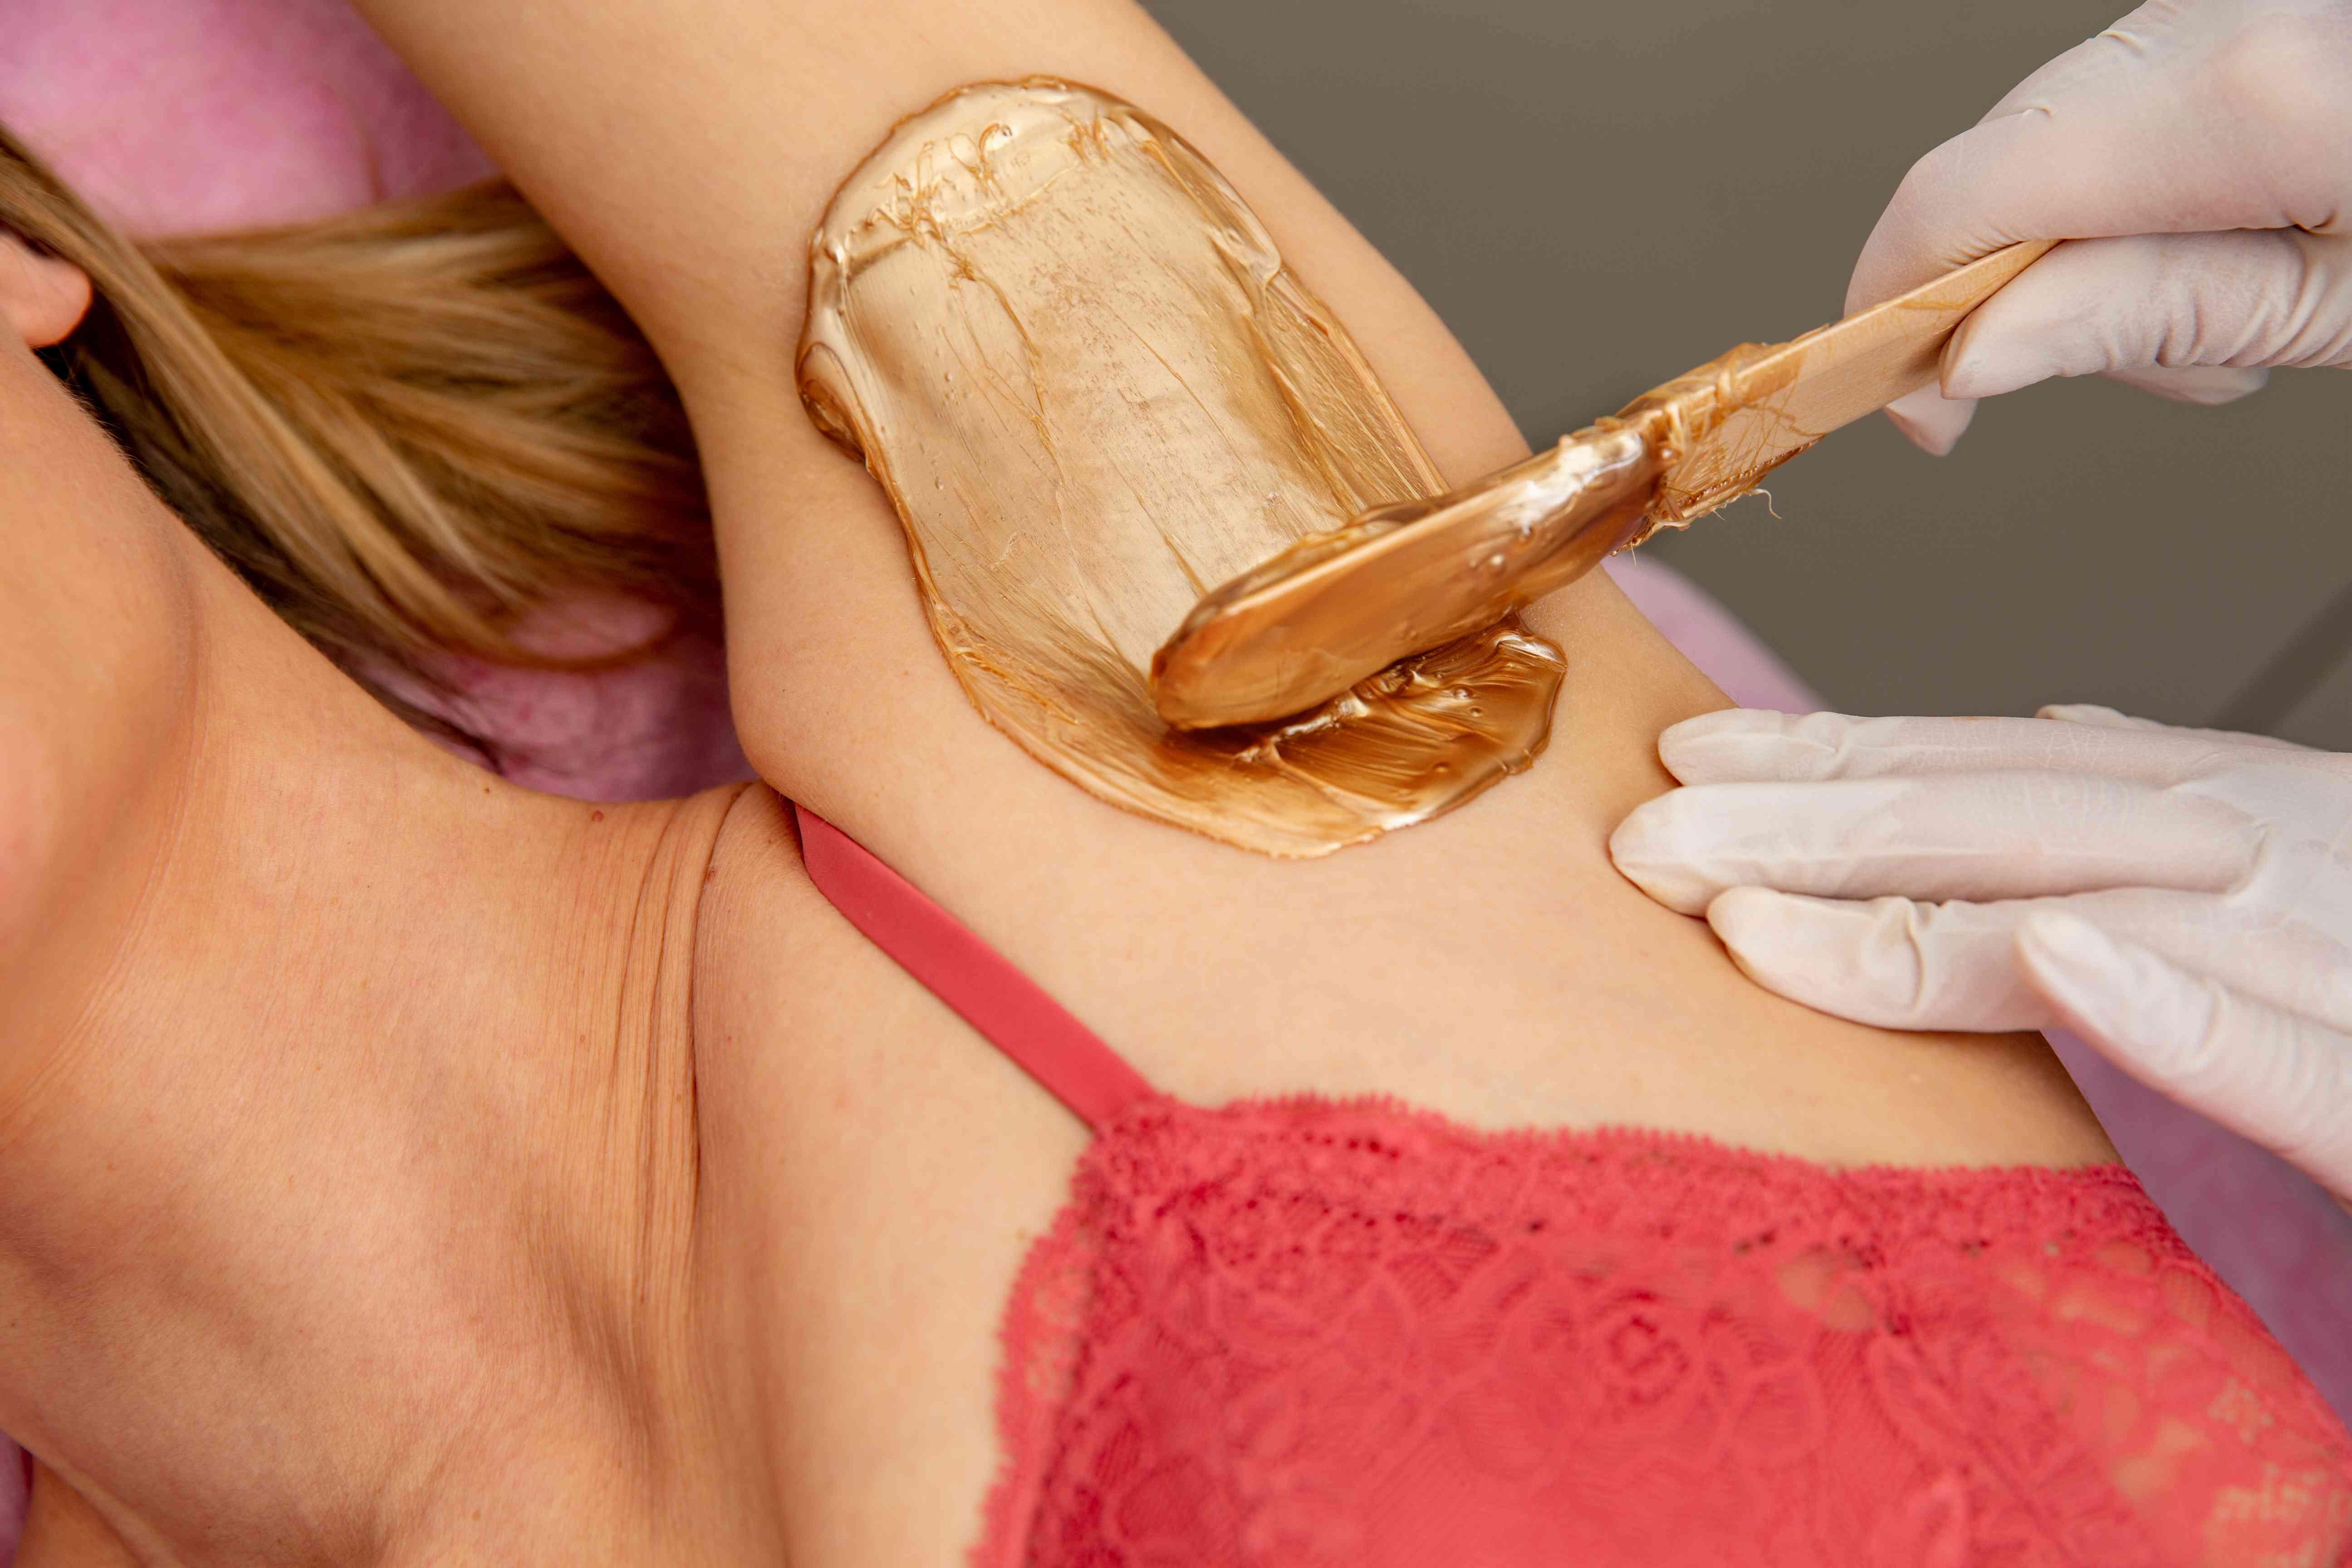 How Long Does Waxing Last? An Esthetician Explains